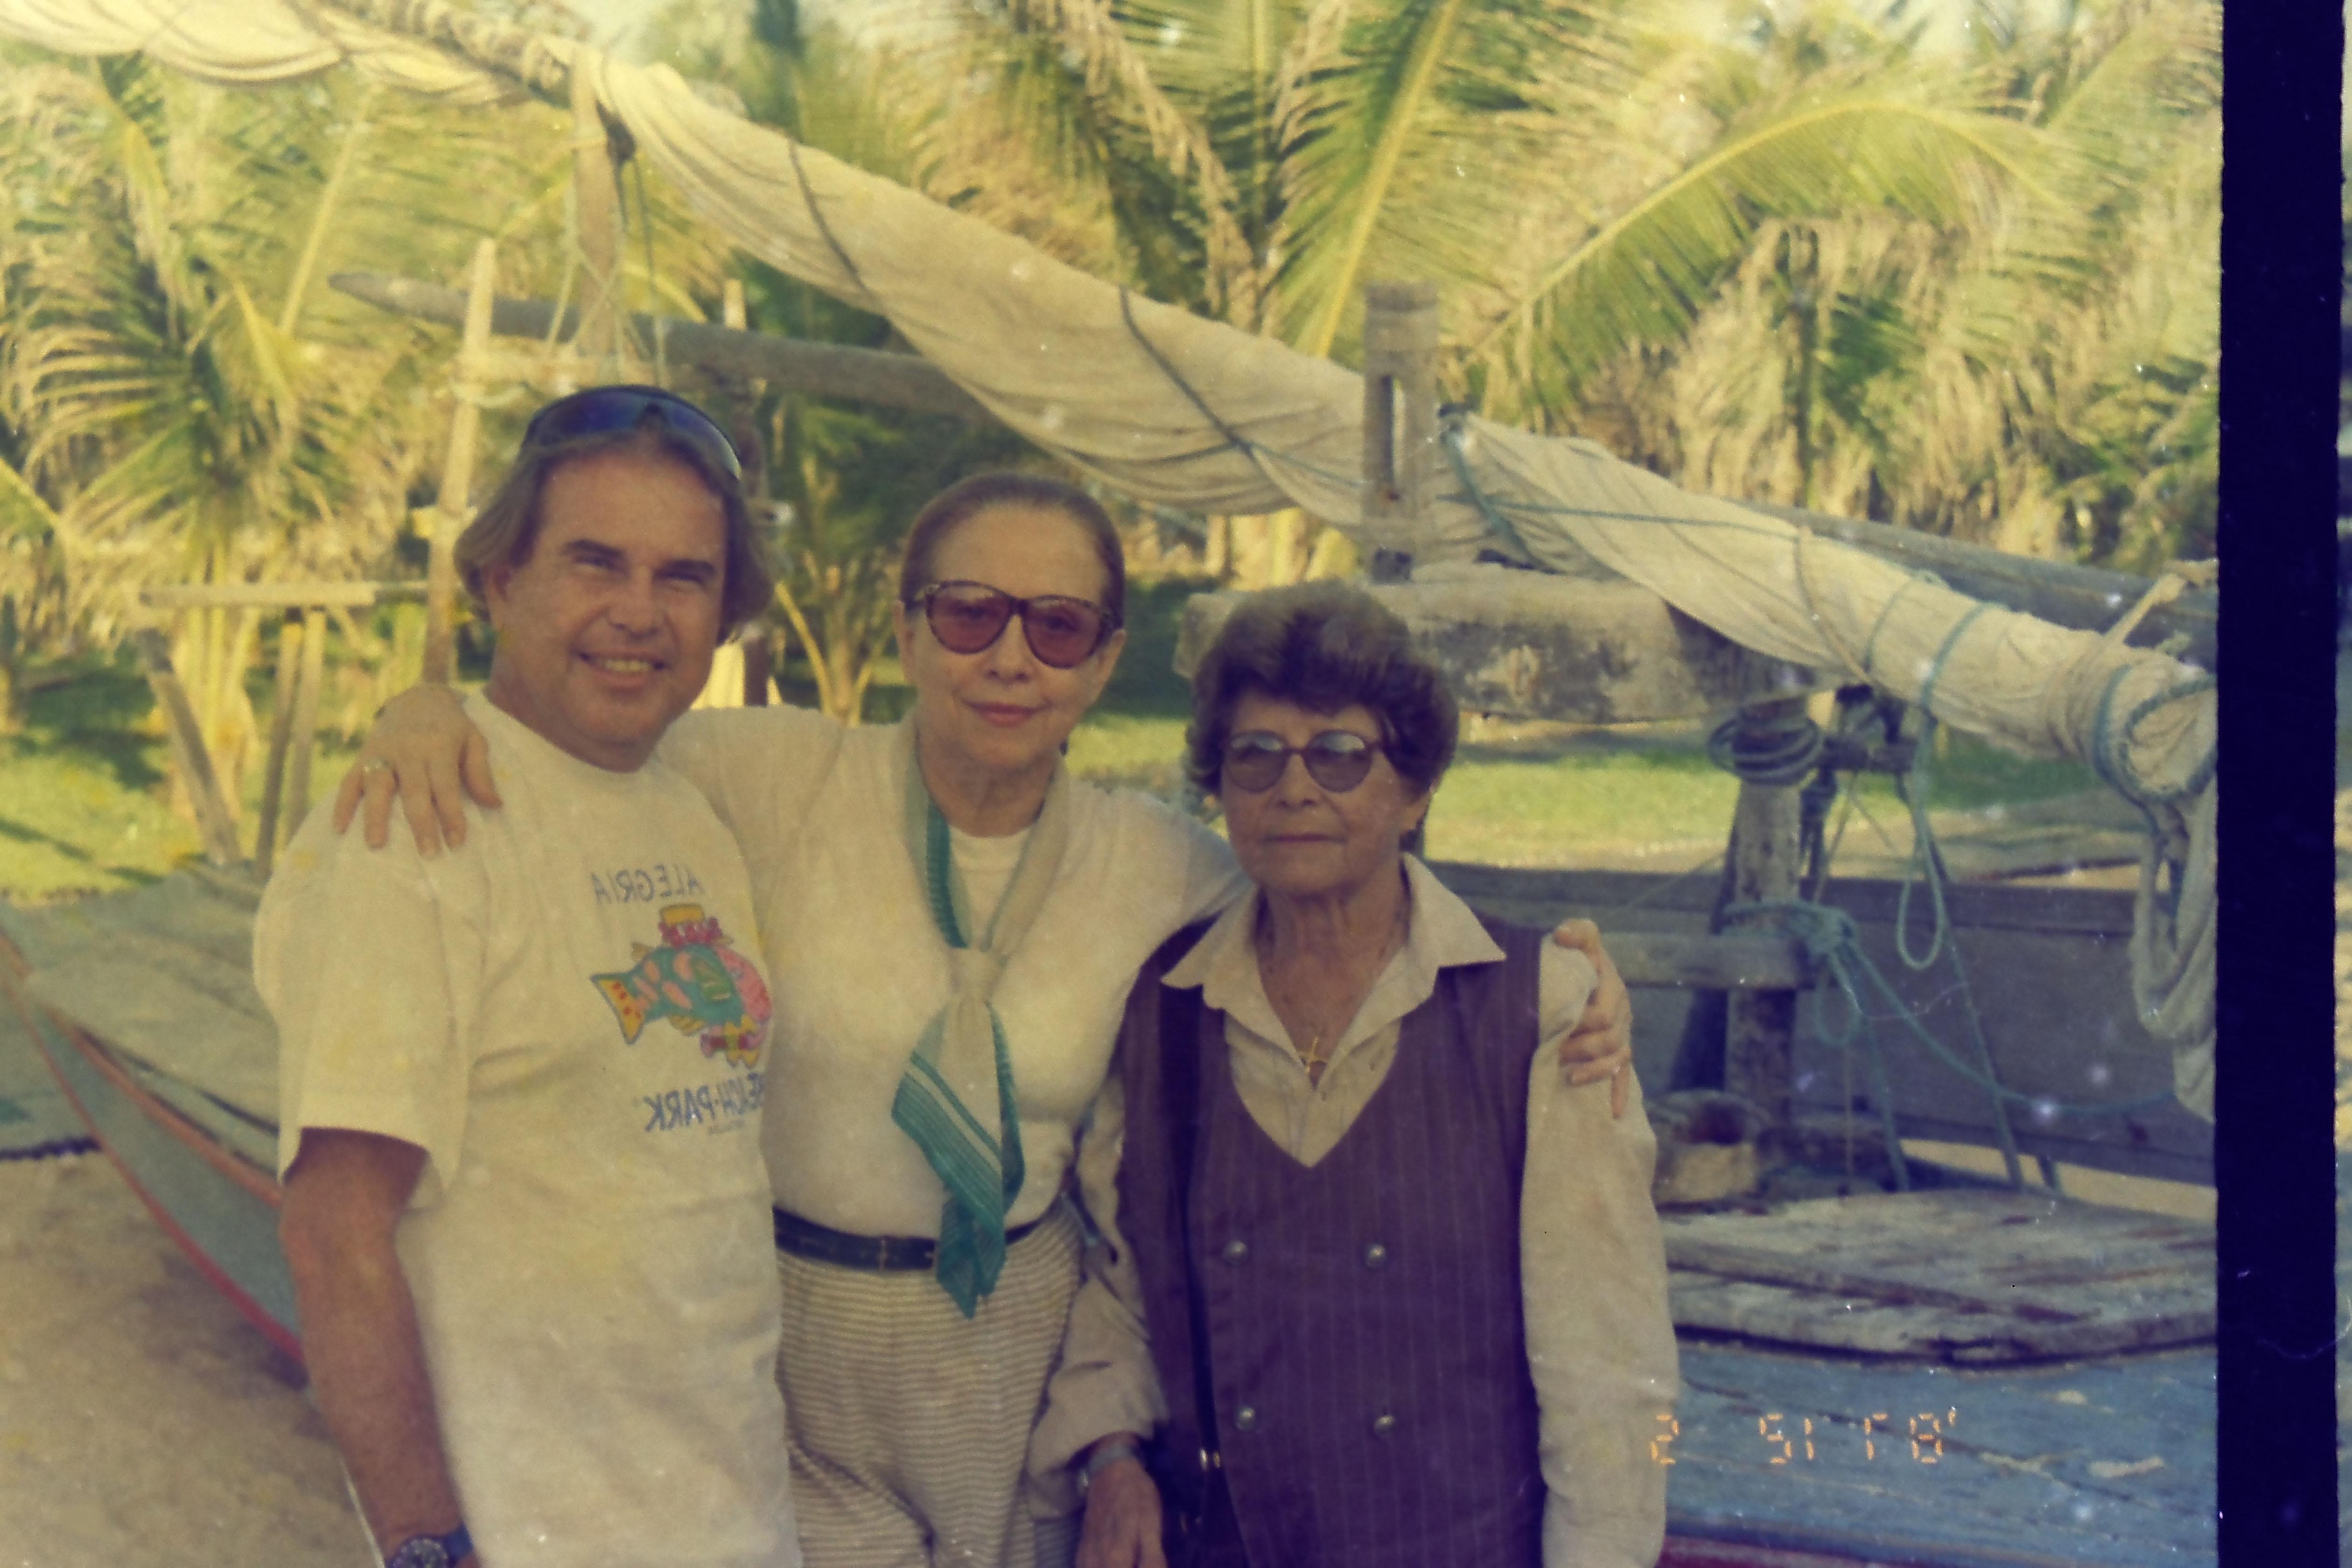 A dama das artes, Fernanda Montenegro faz 90 anos